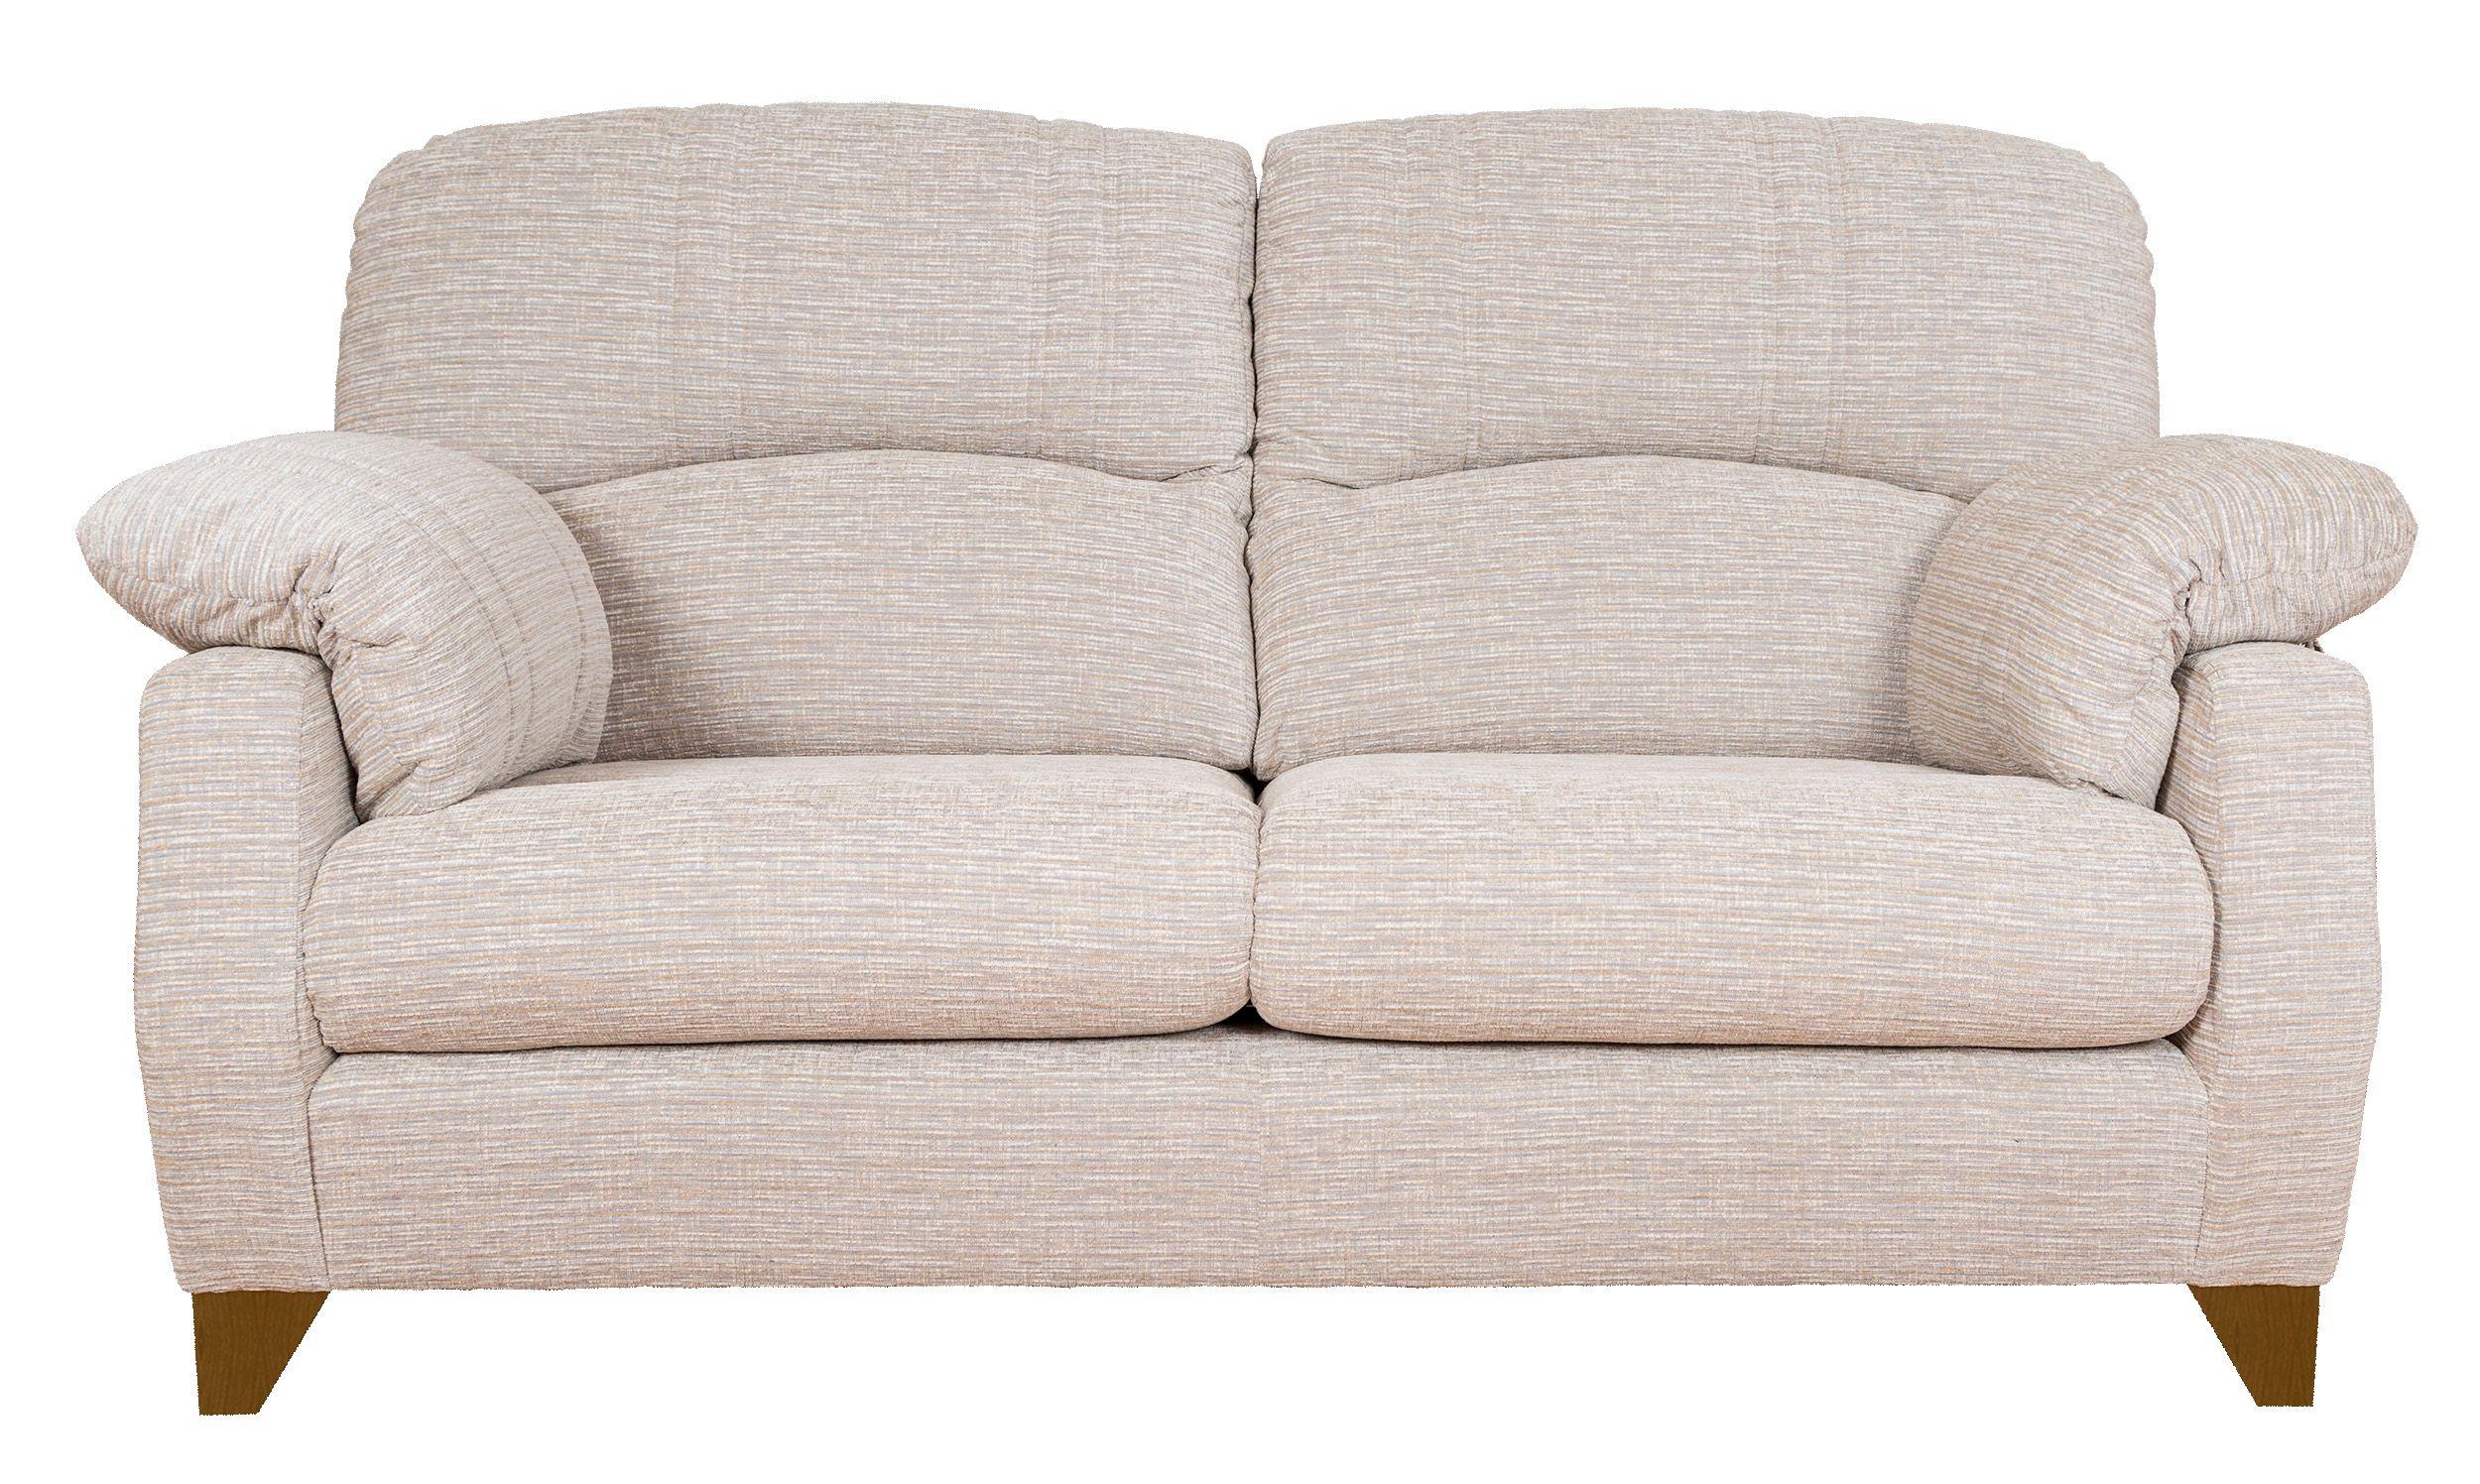 Aspen 2 Seater Sofa